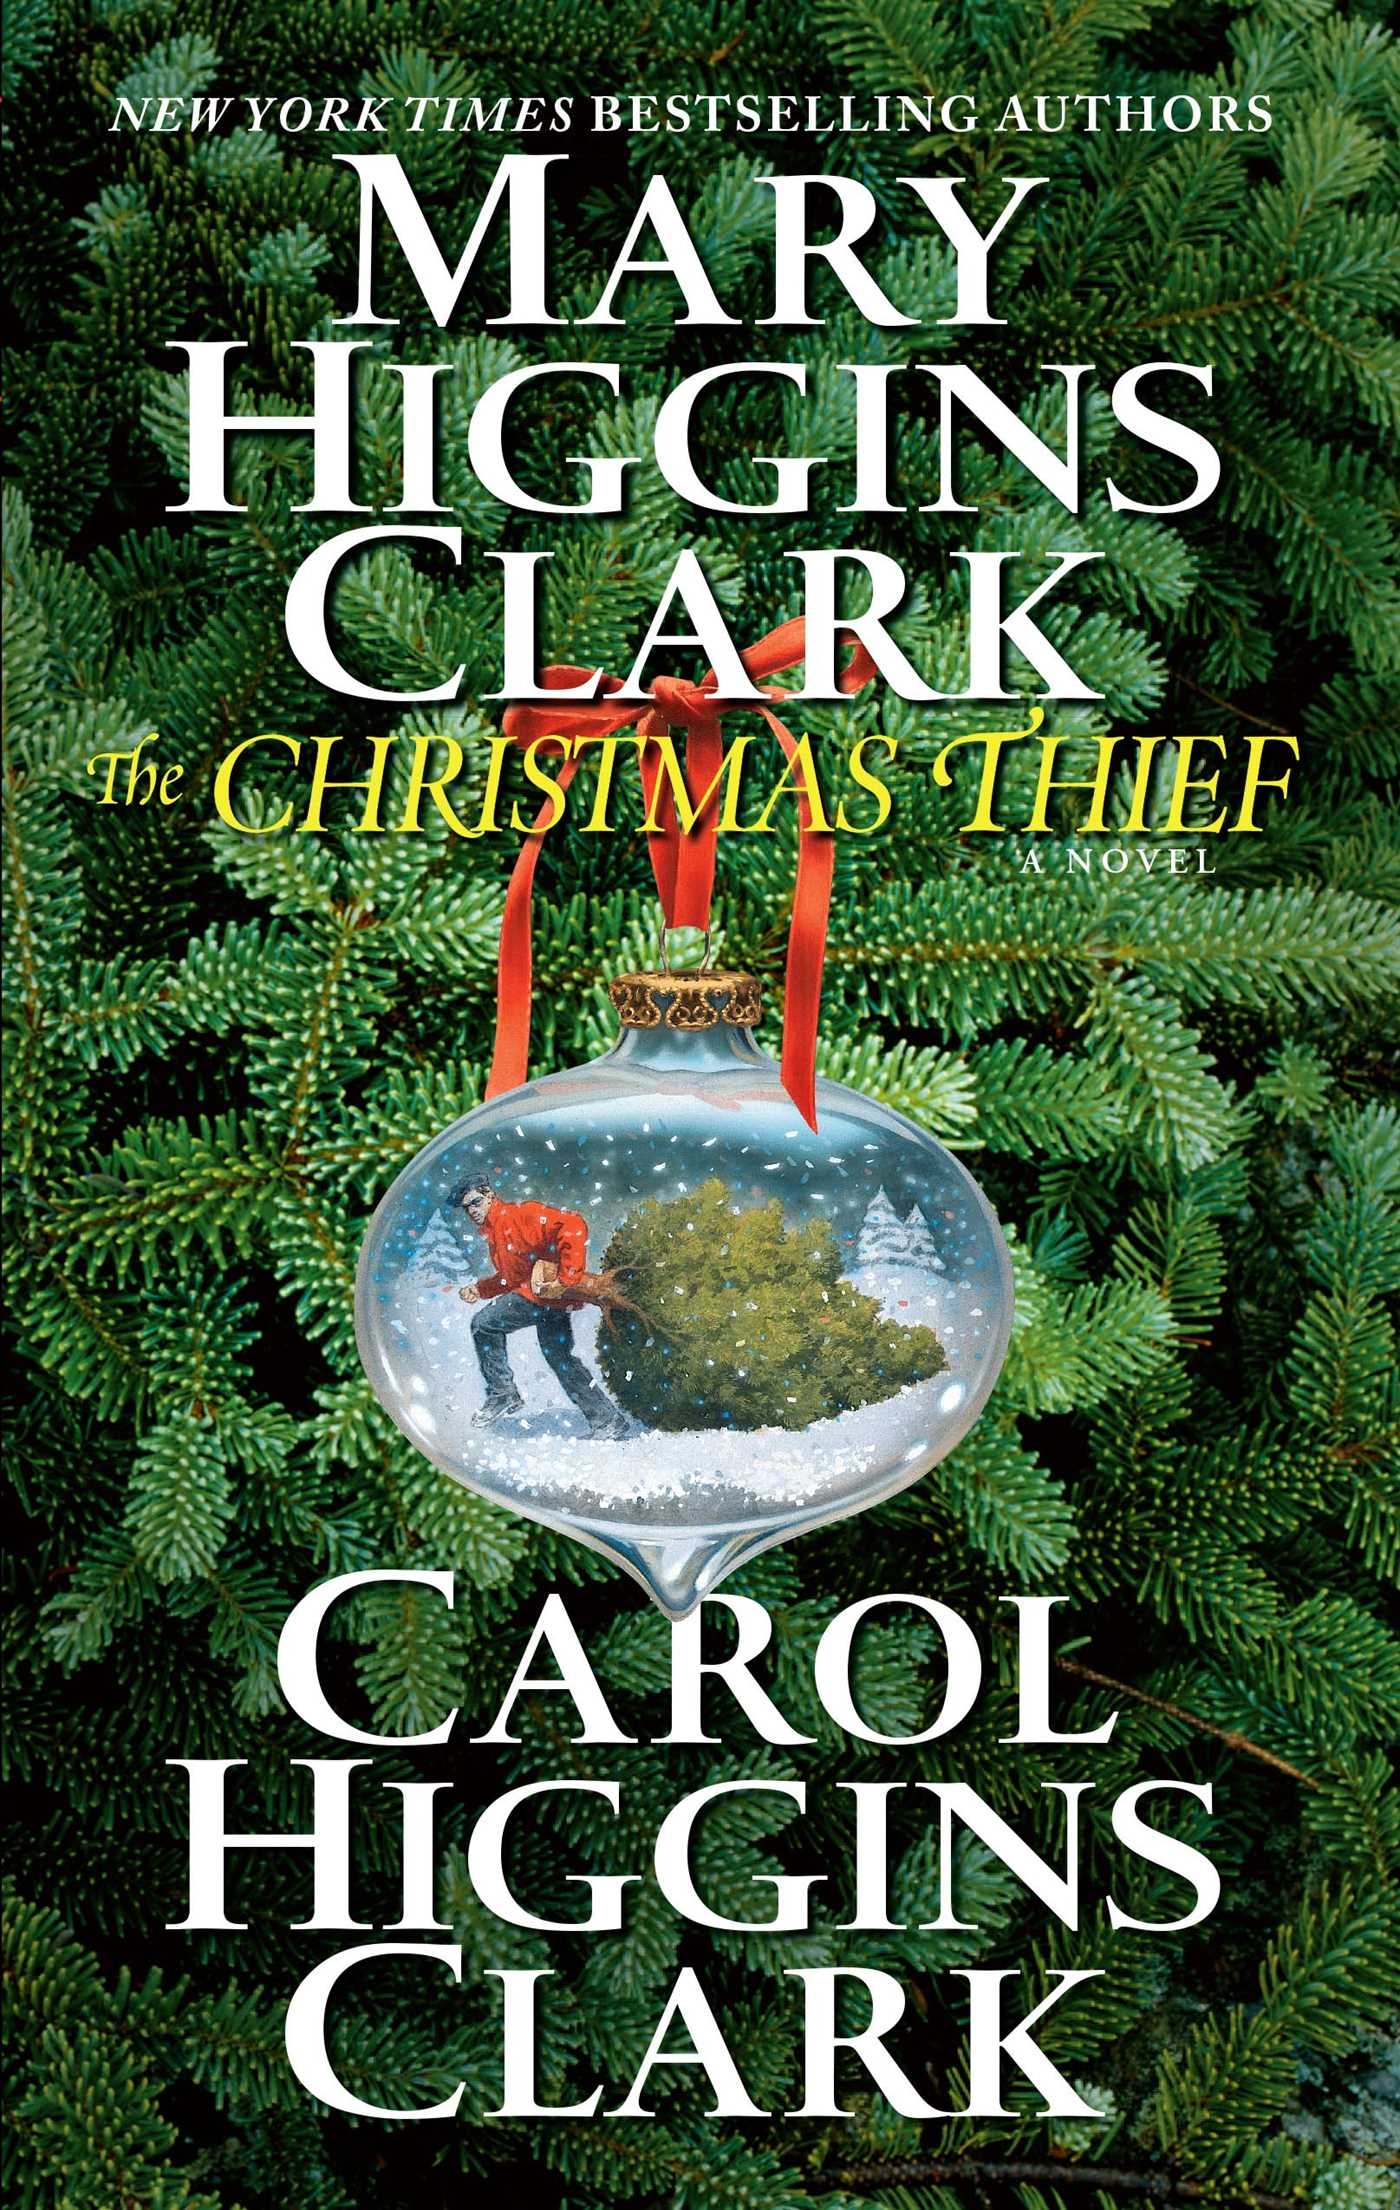 The christmas thief 9780743274203 hr